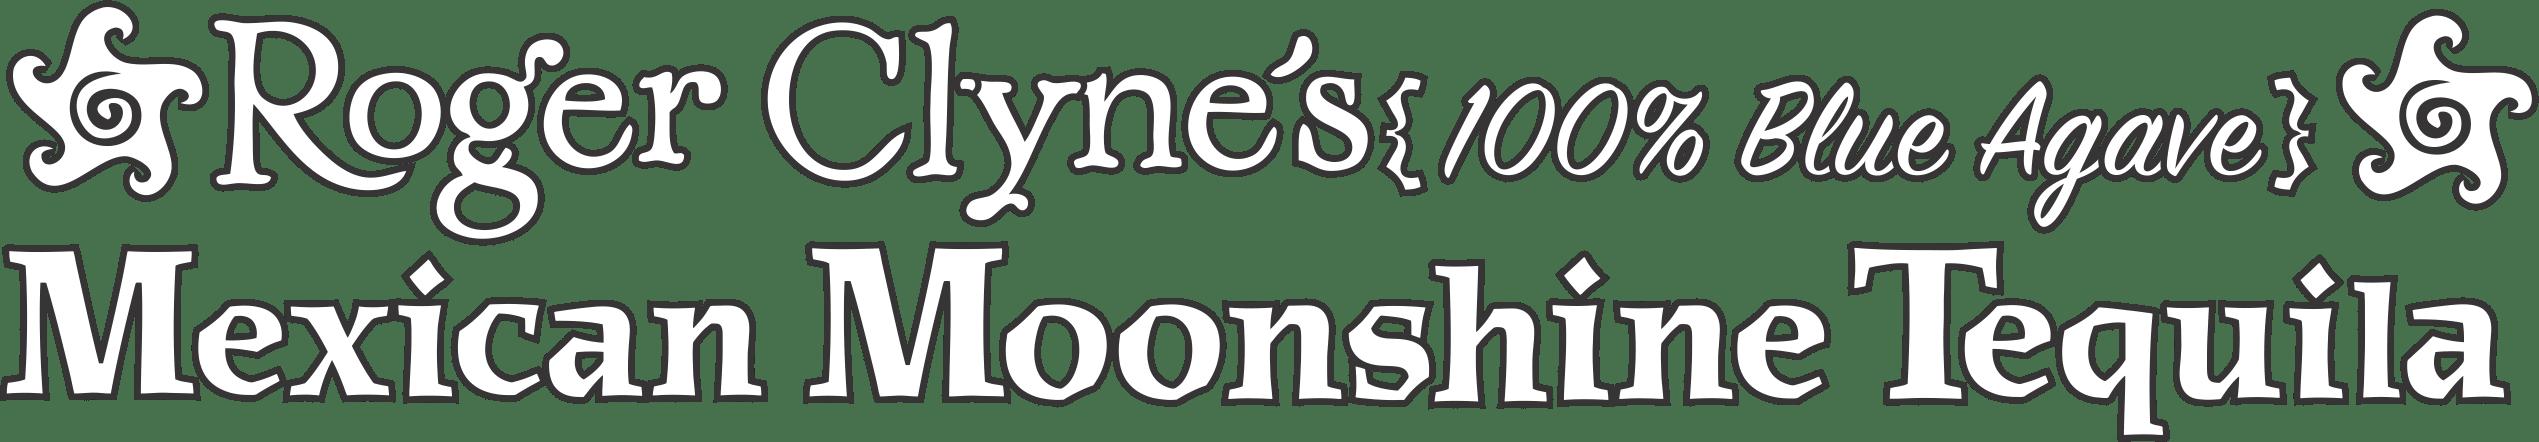 Roger Clyne Mexican Moonshine Tequila 2019 Baseball